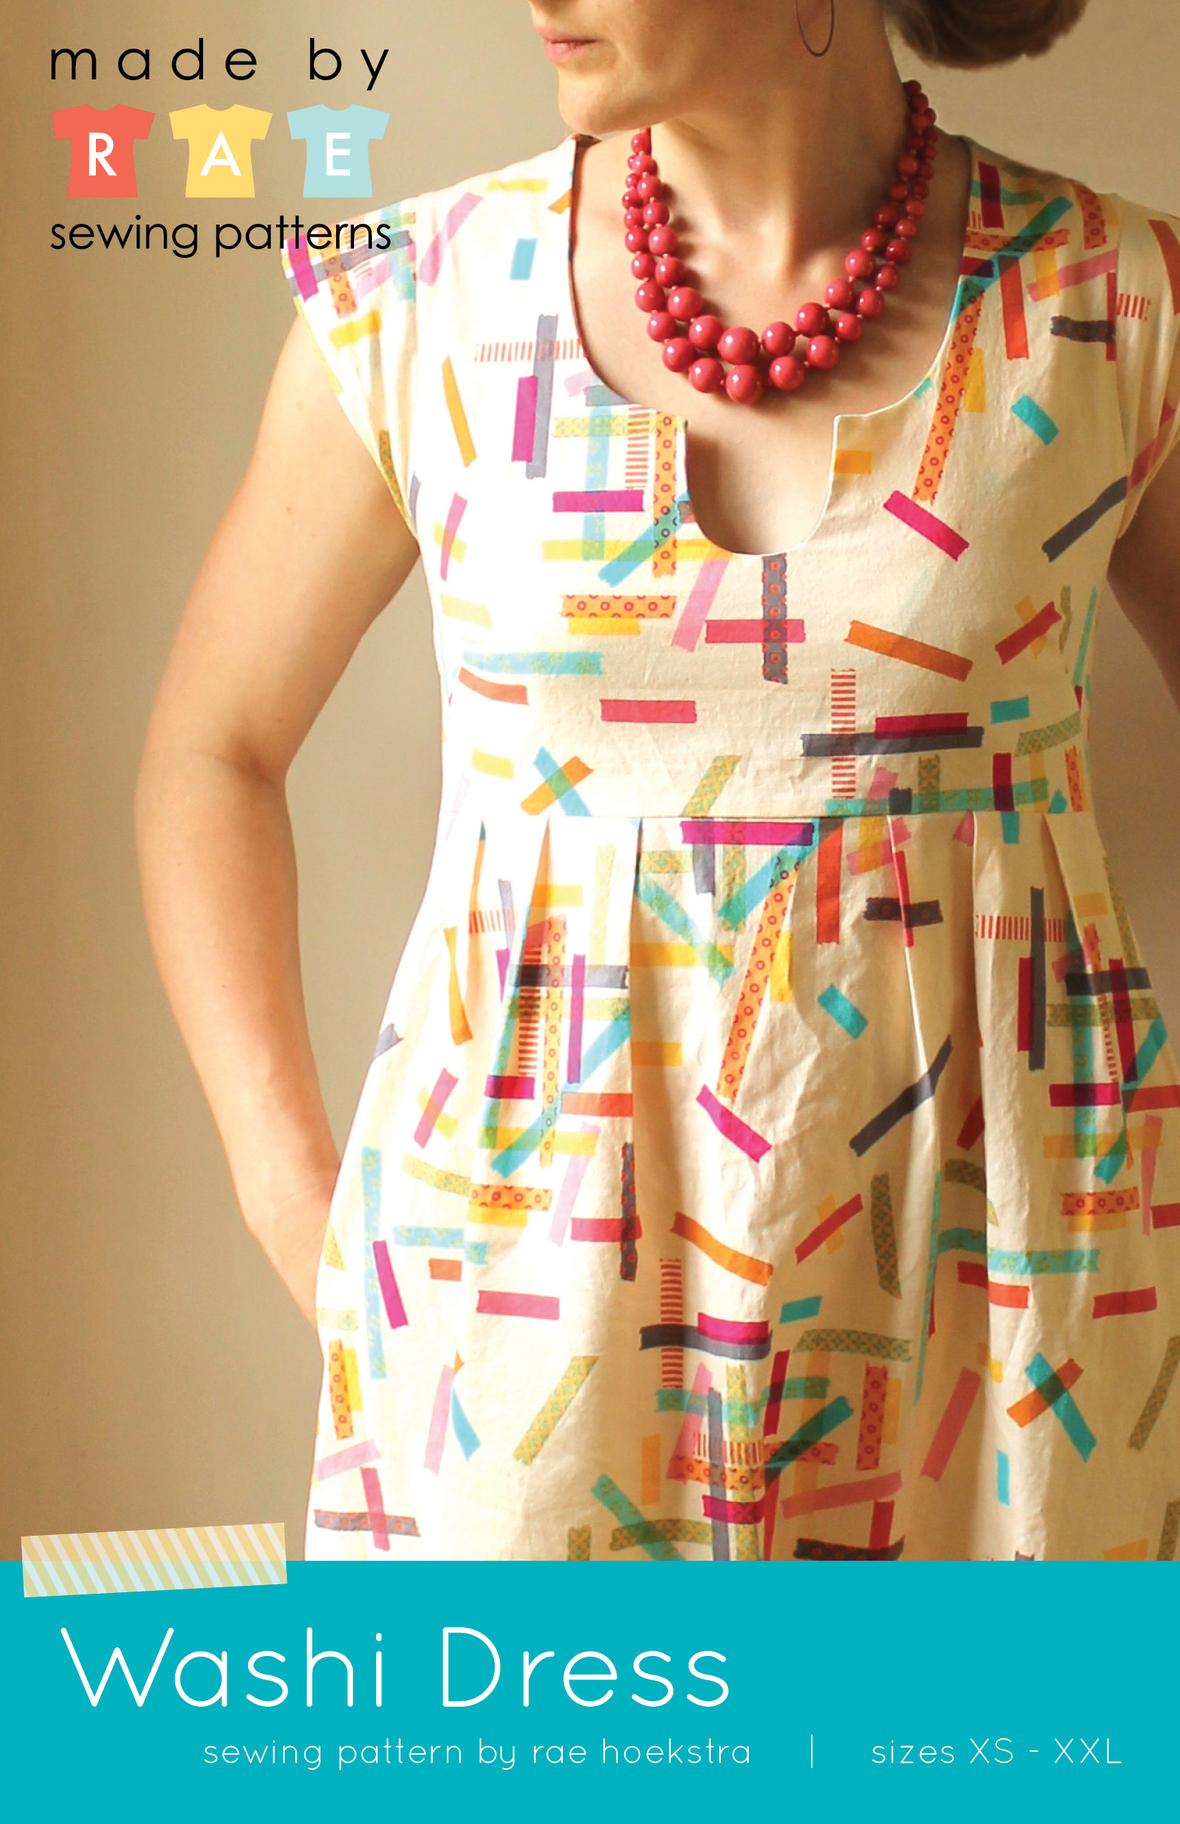 made by rae washi dress sewing pattern